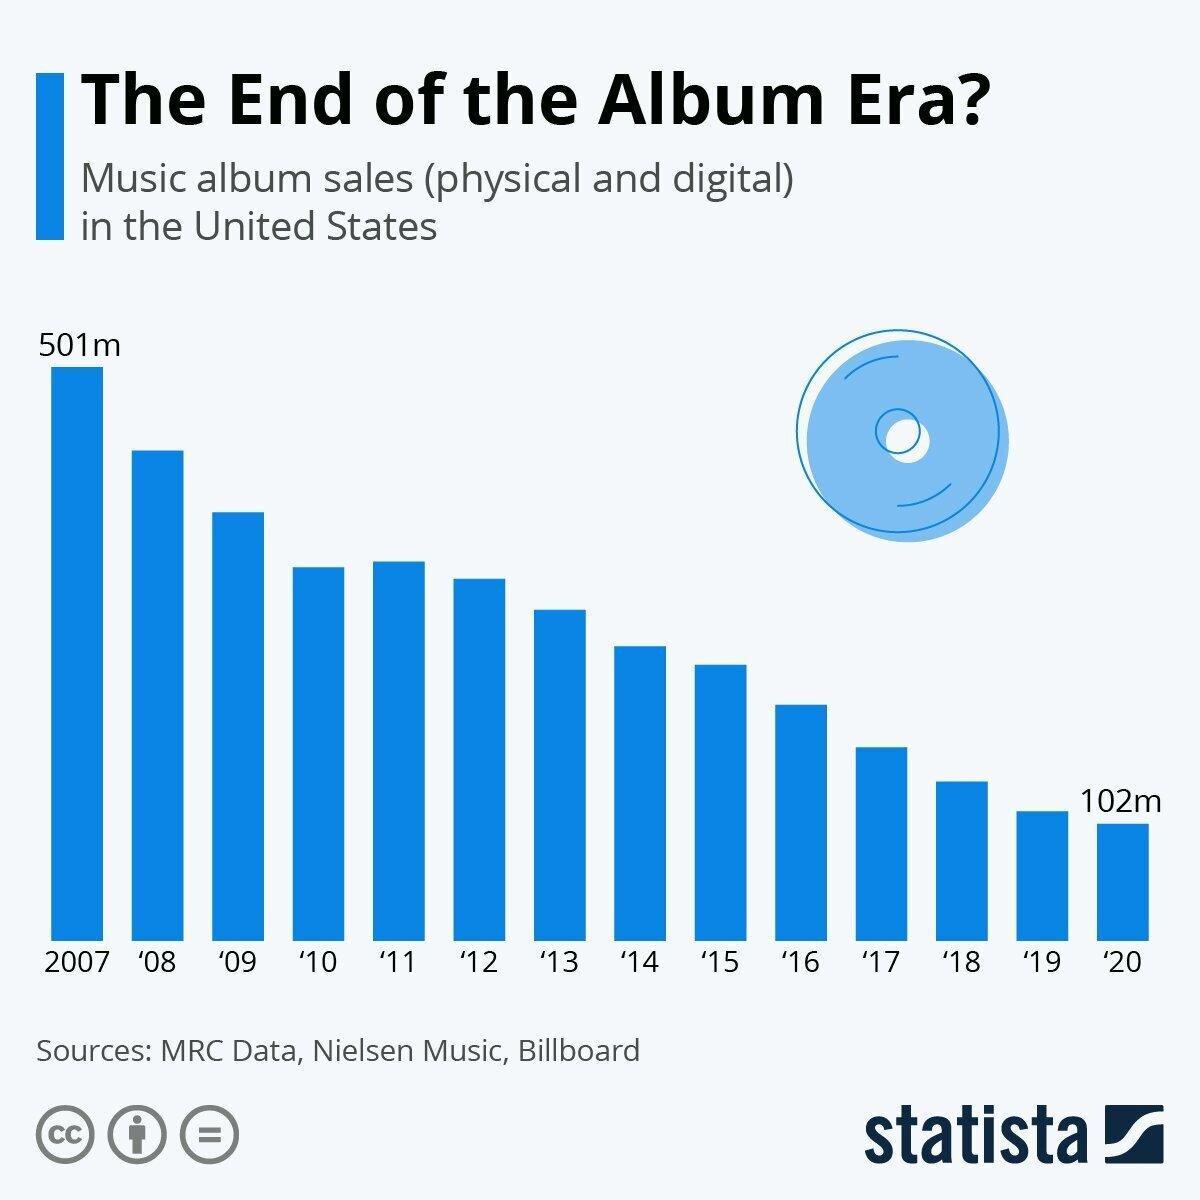 The End of the Album Era?